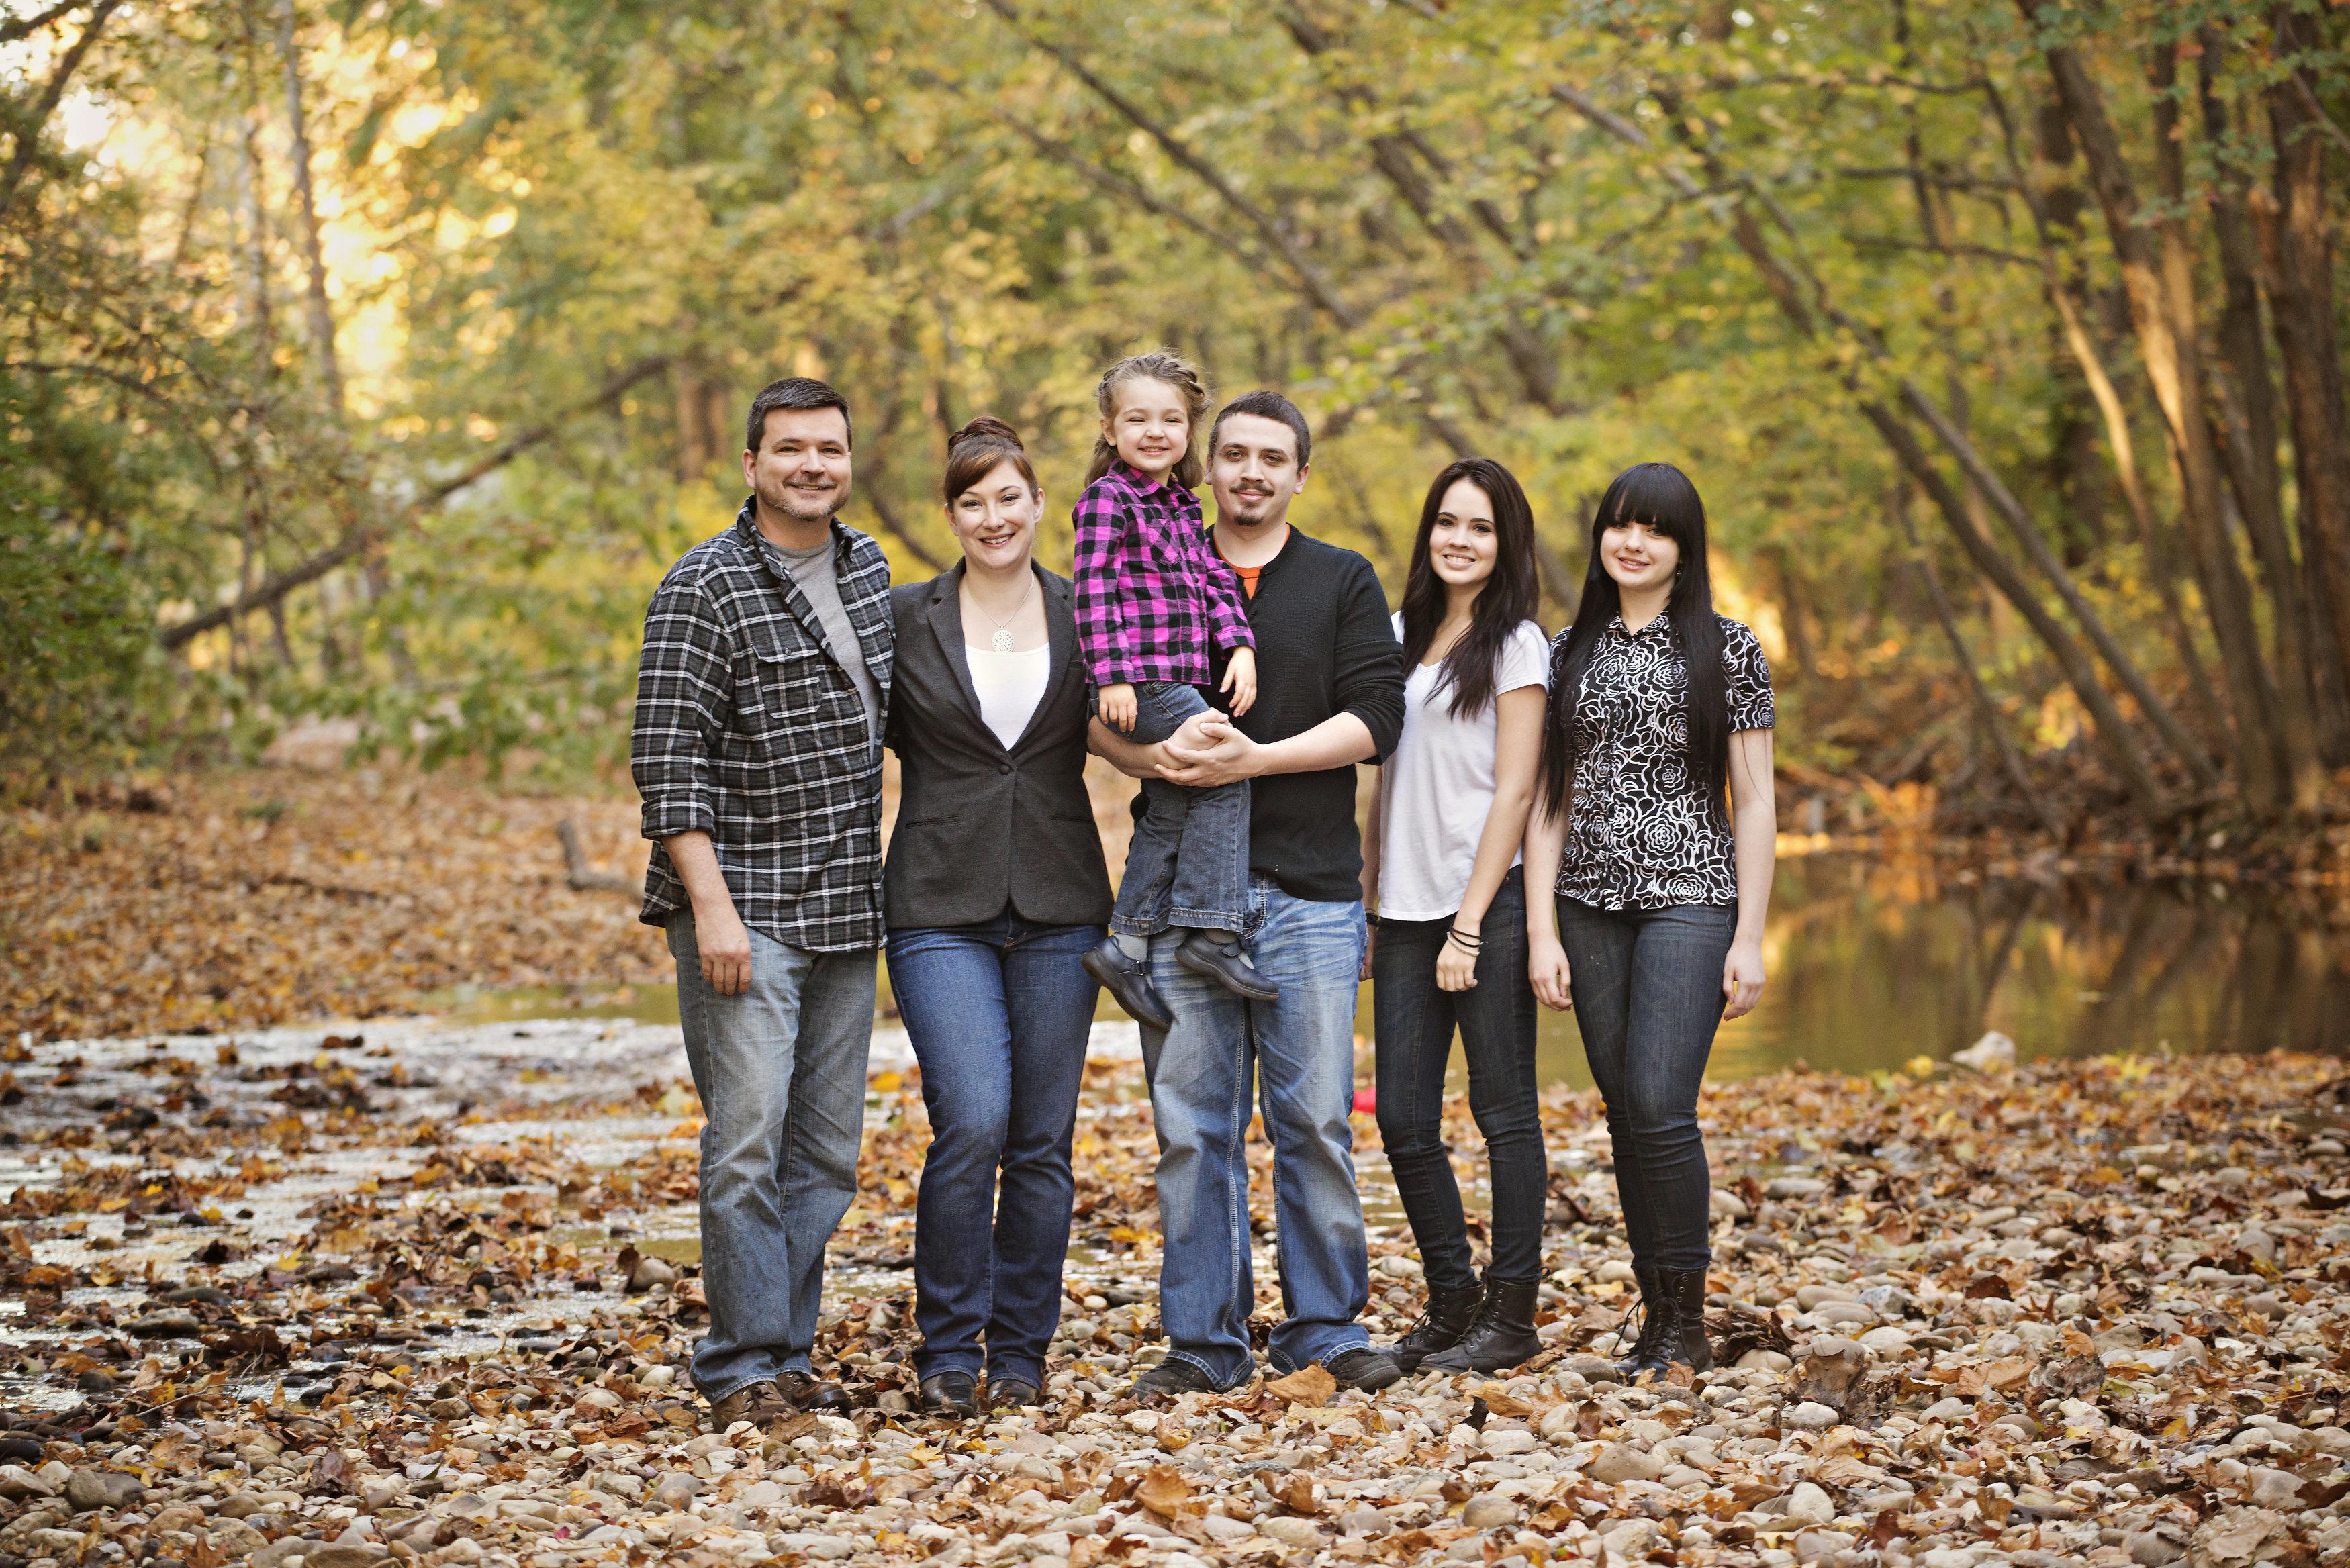 Jenny Phillipswith her husband Jeff and their four kids:Addie,Shane, AshlandandJuliet.